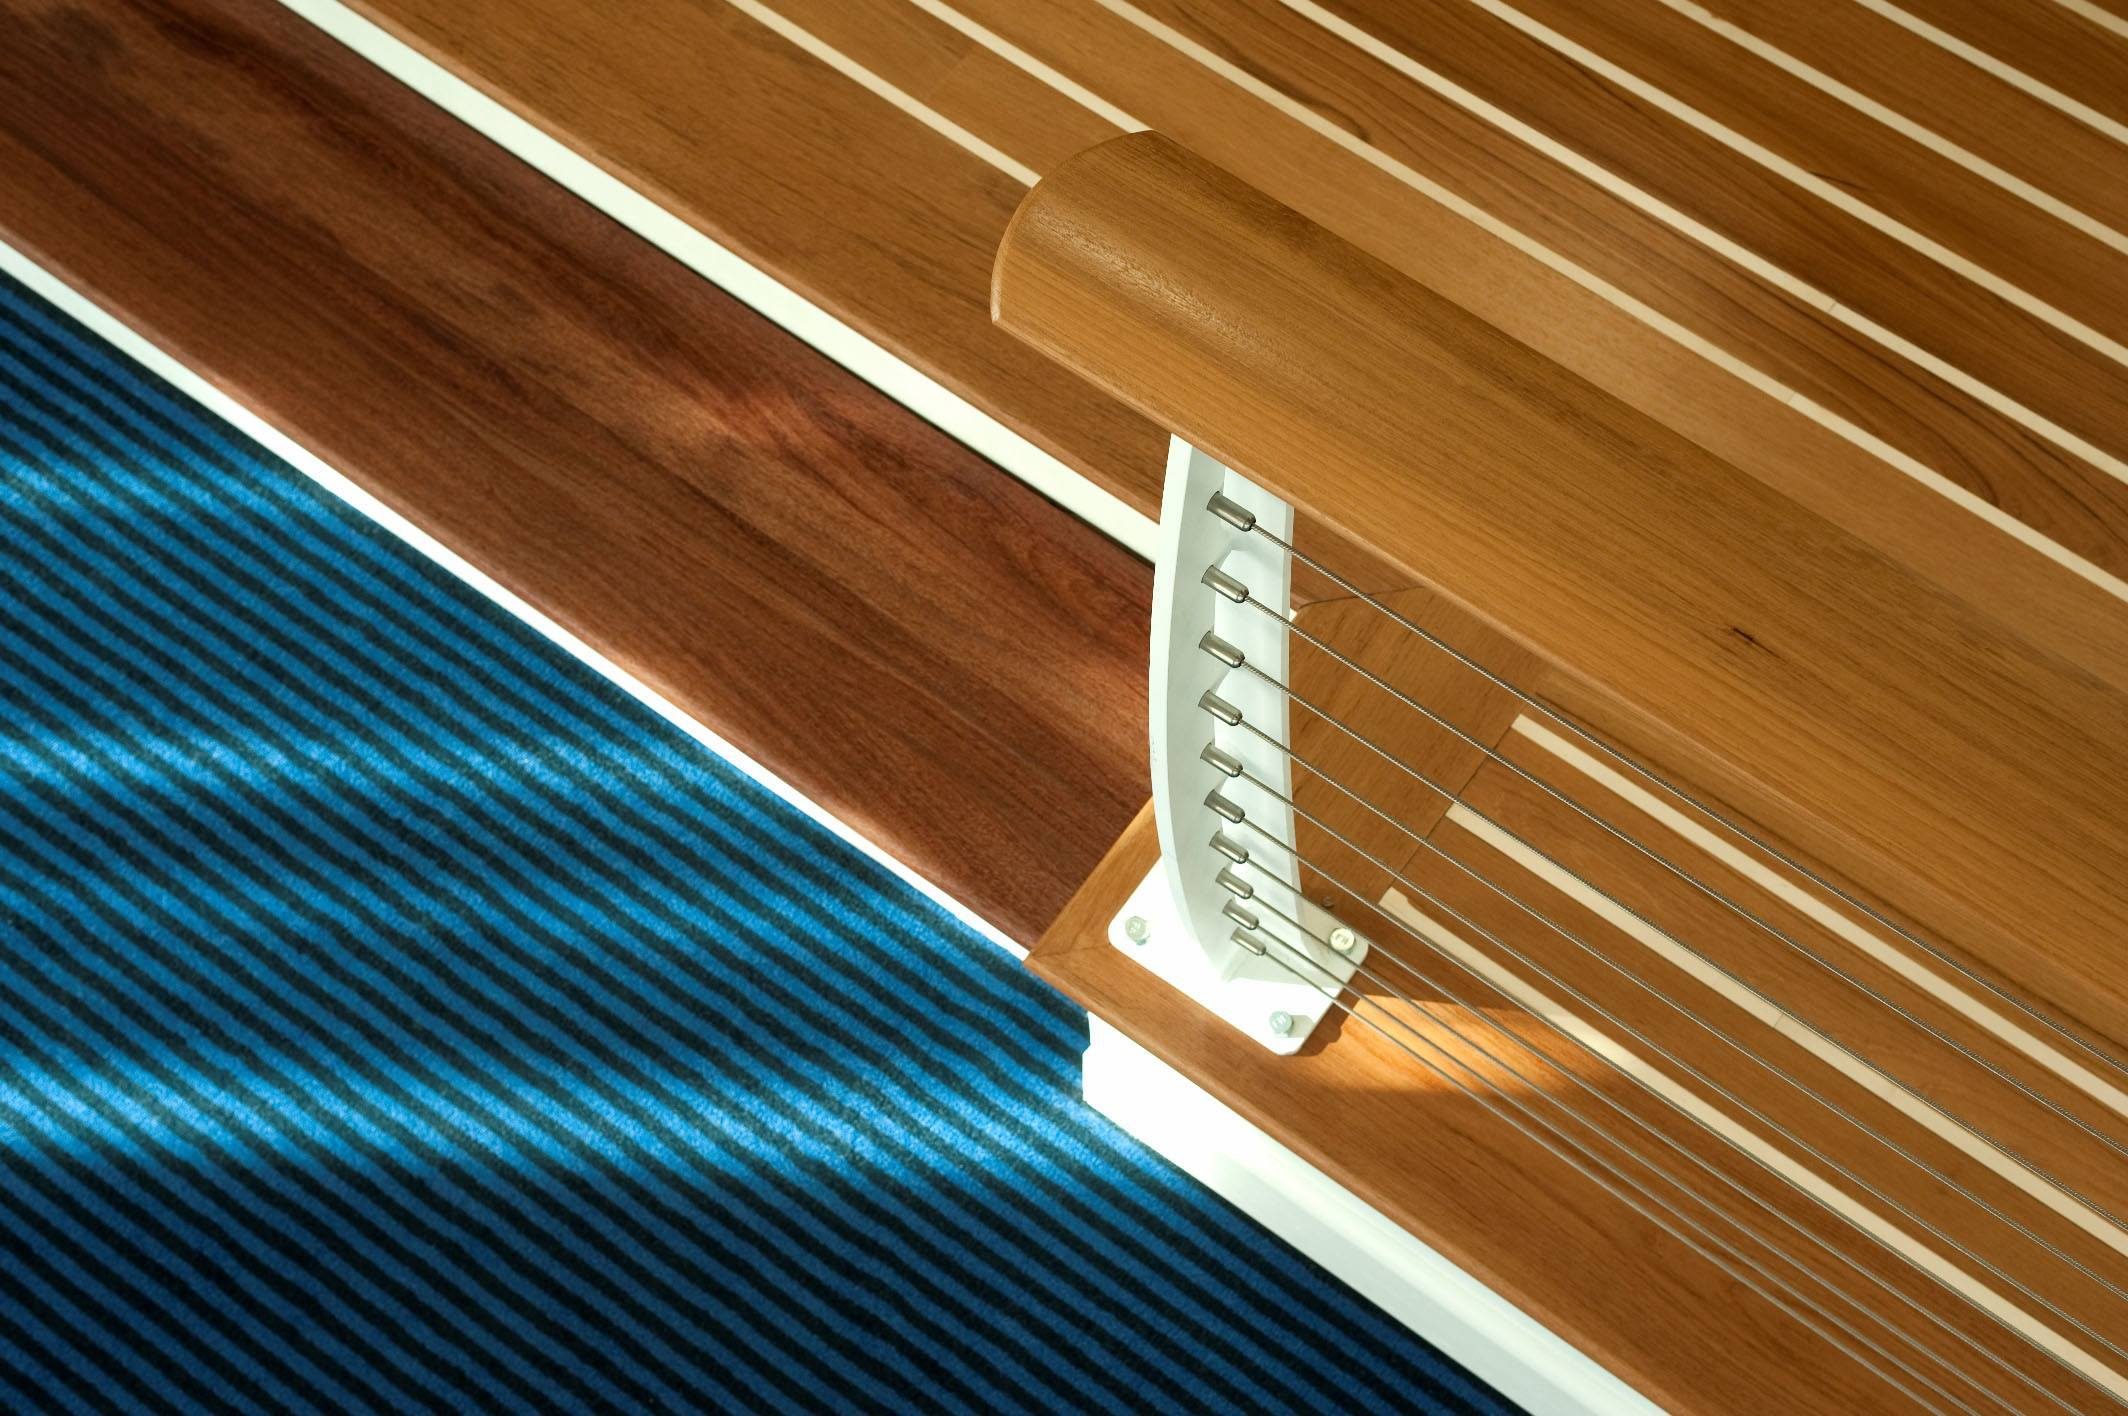 bowed nautical cable railing